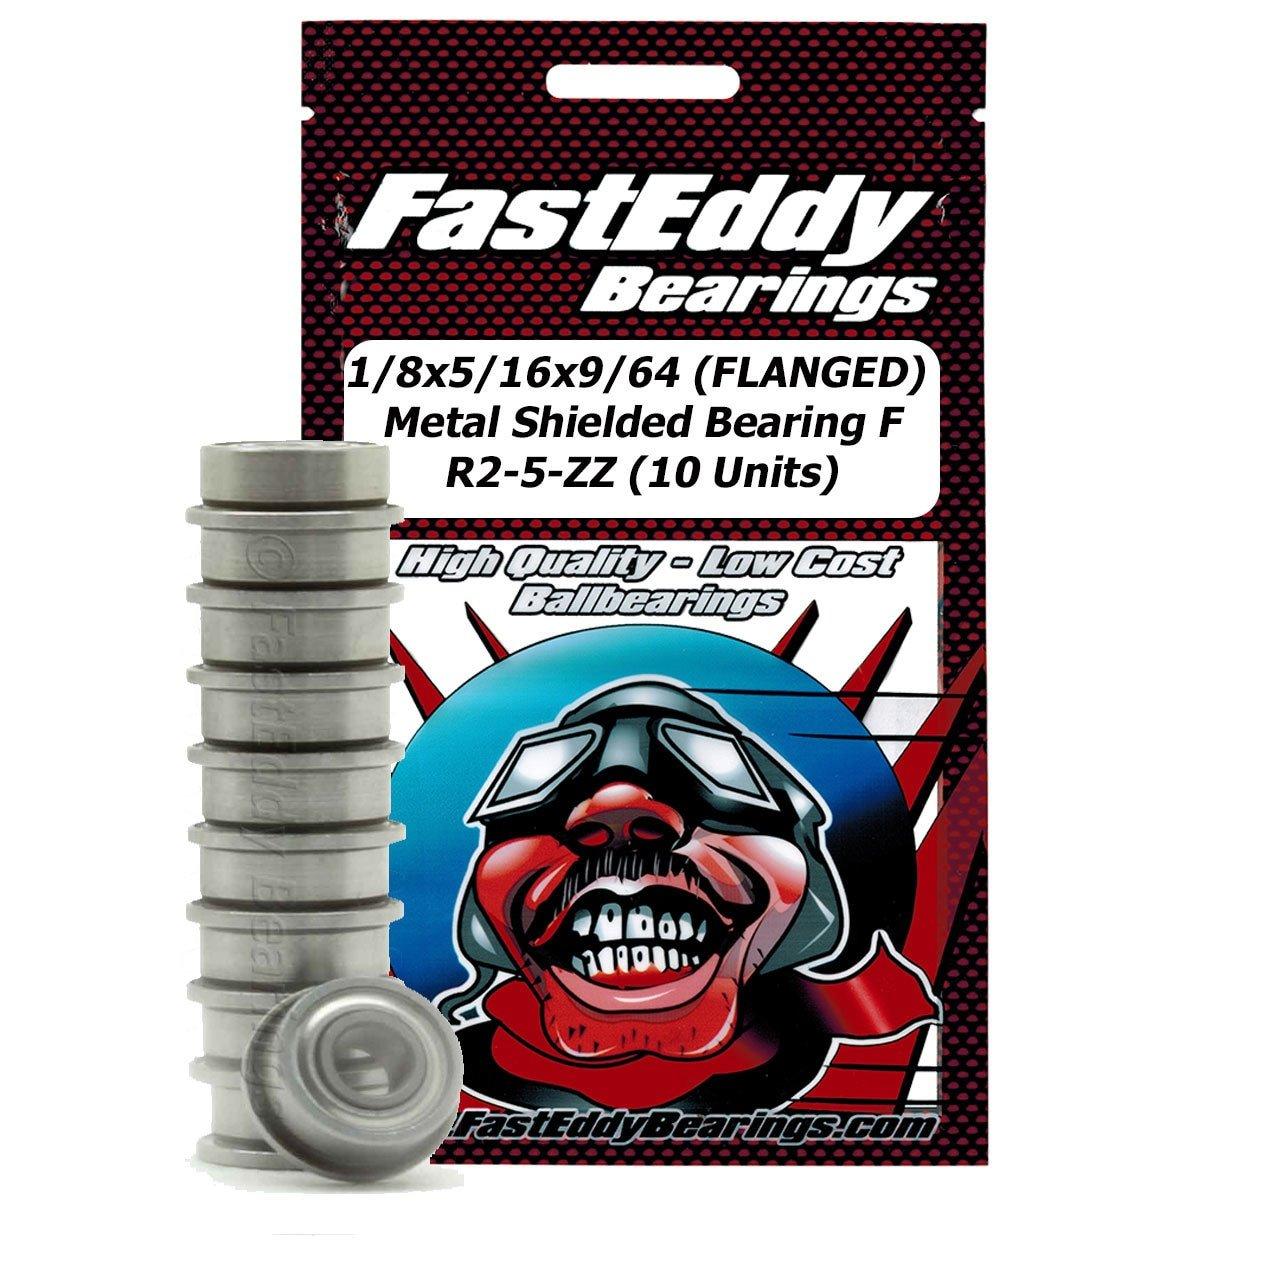 1/8x5/16x9/64 (FLANGED) Metal Shielded Bearing FR2-5-ZZ (10 Units)